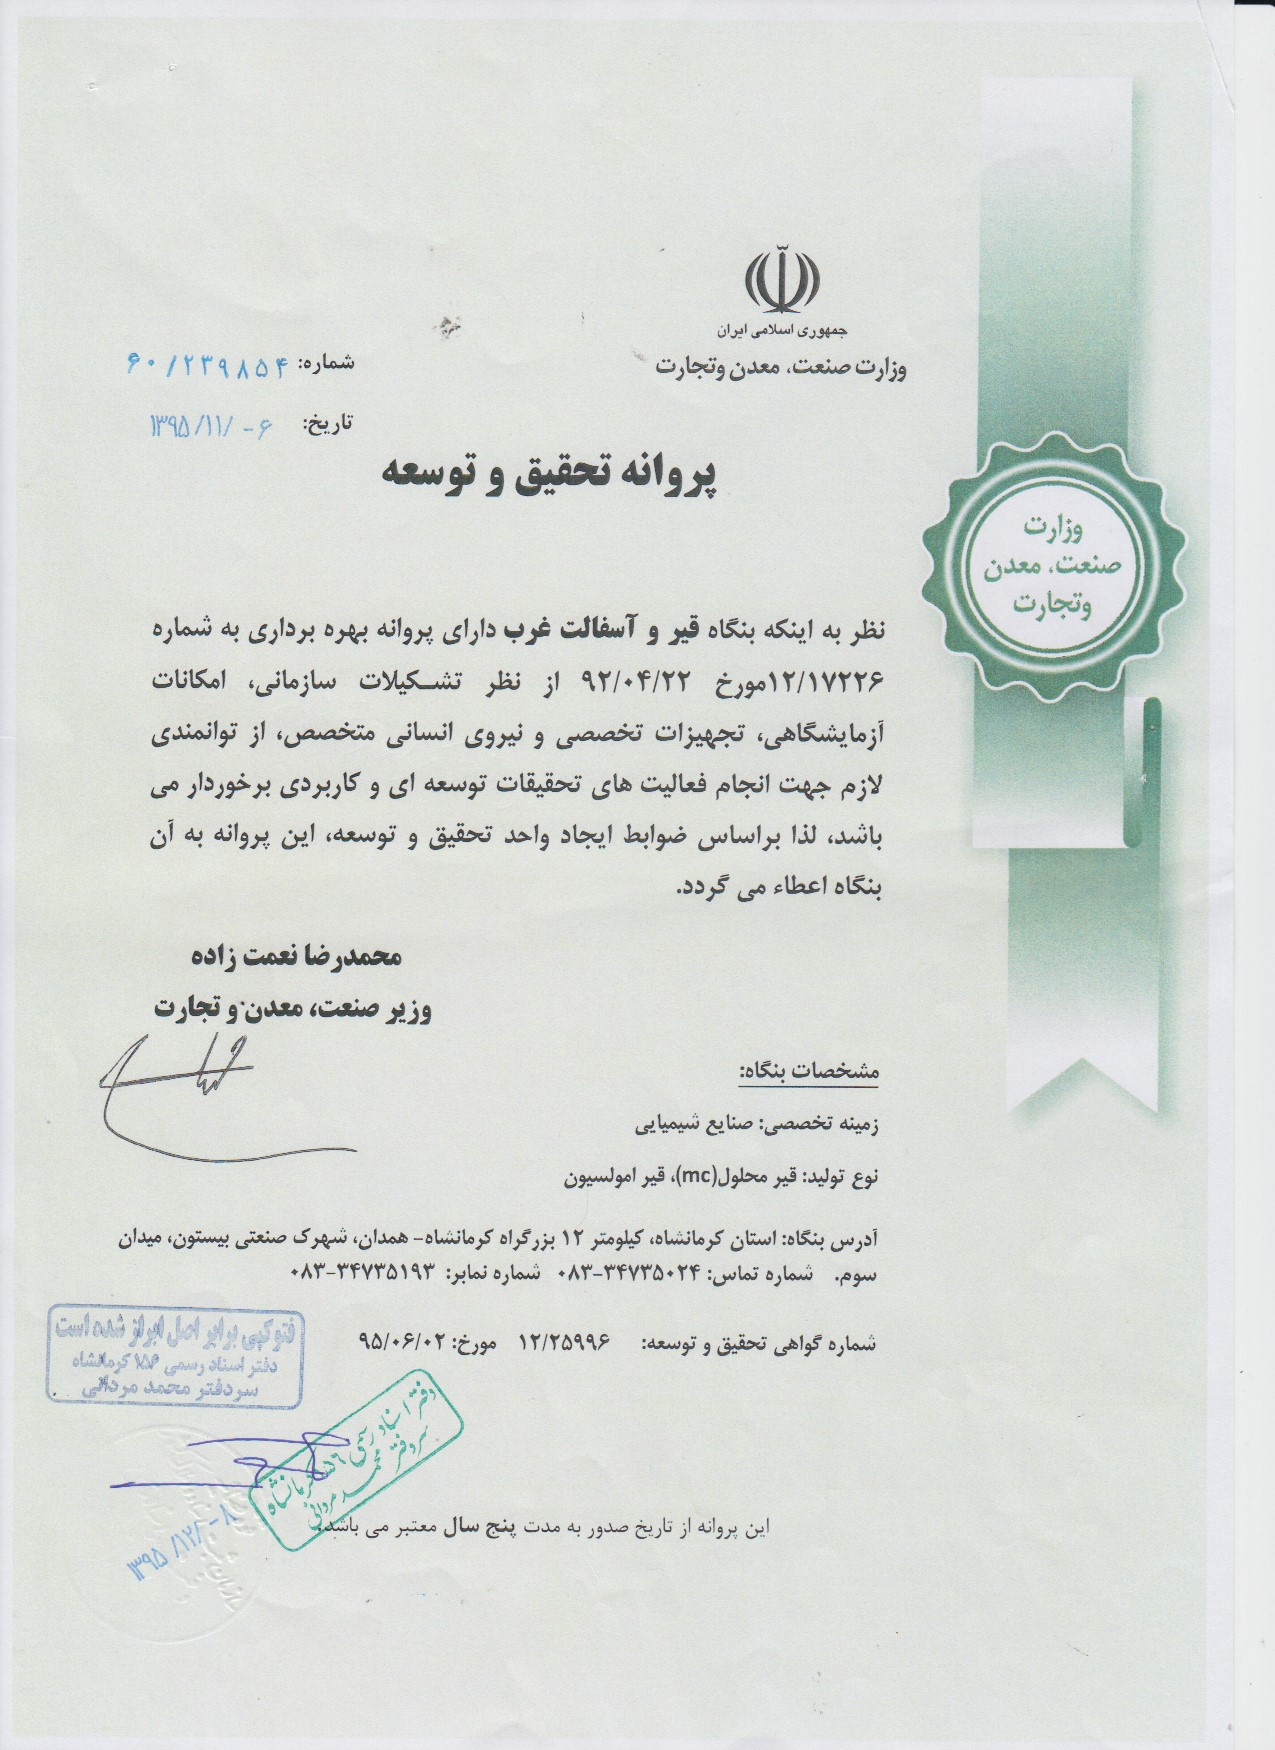 R&D License